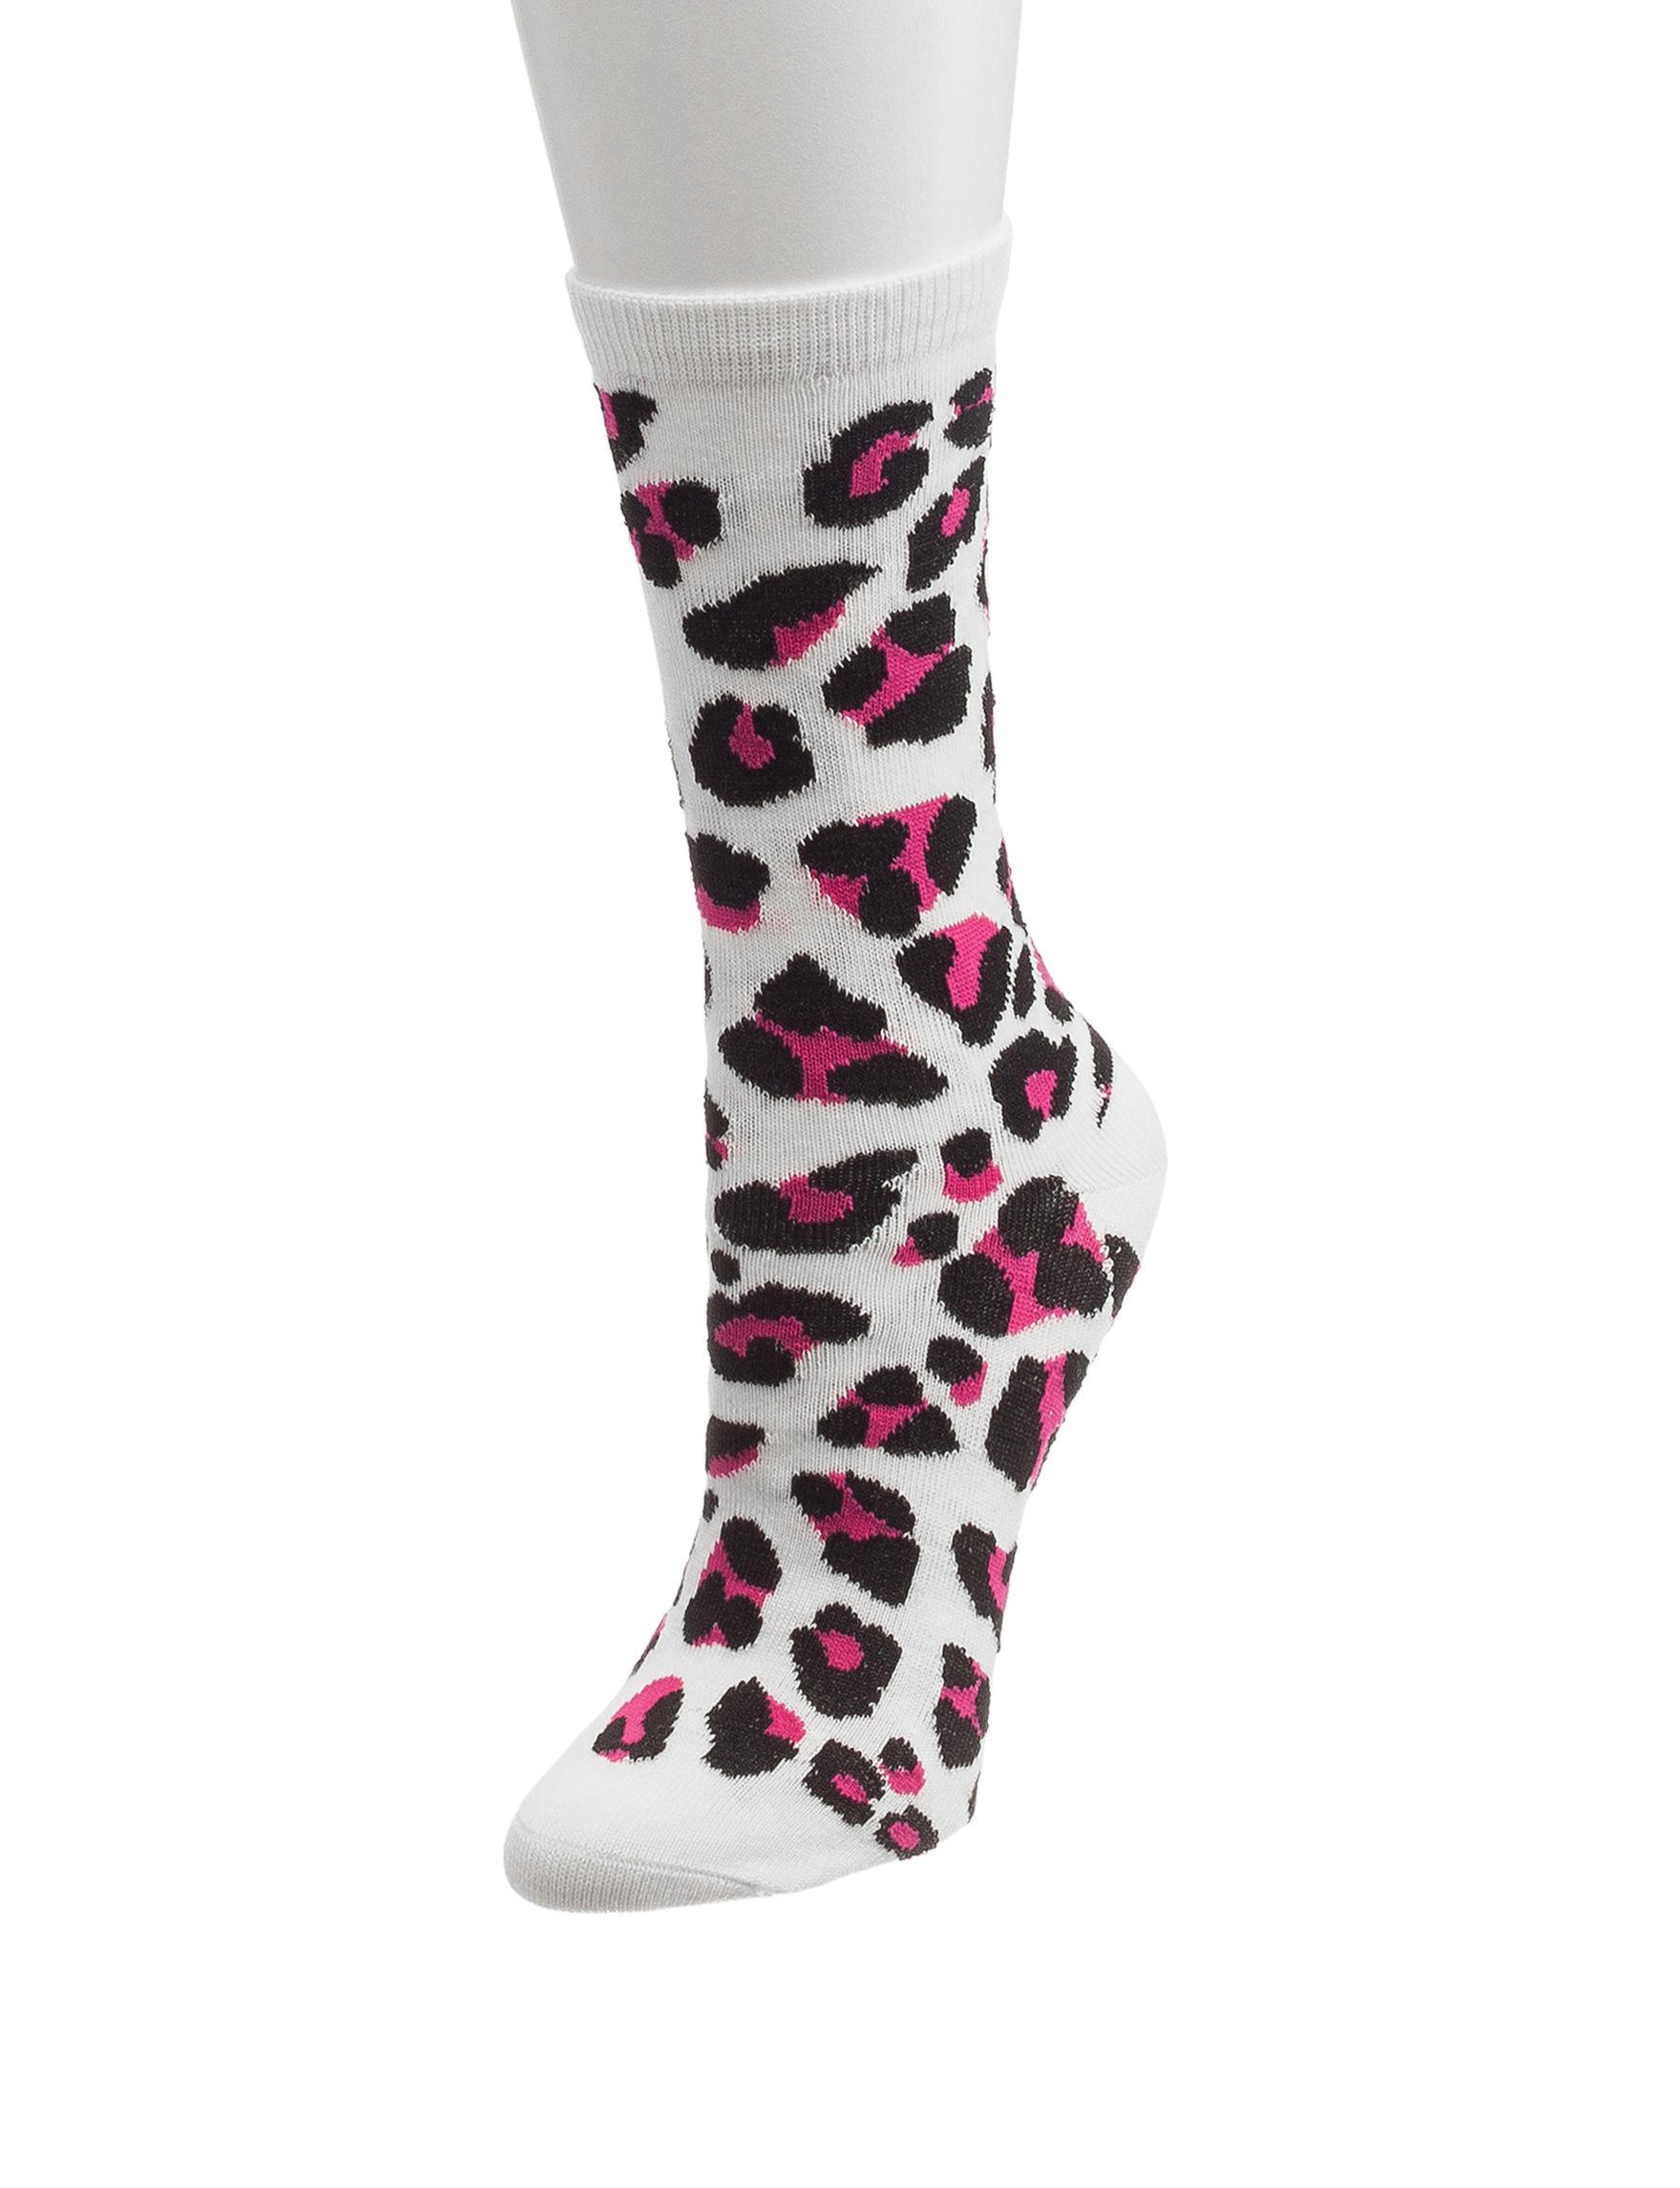 HS by Happy Socks Beige Socks